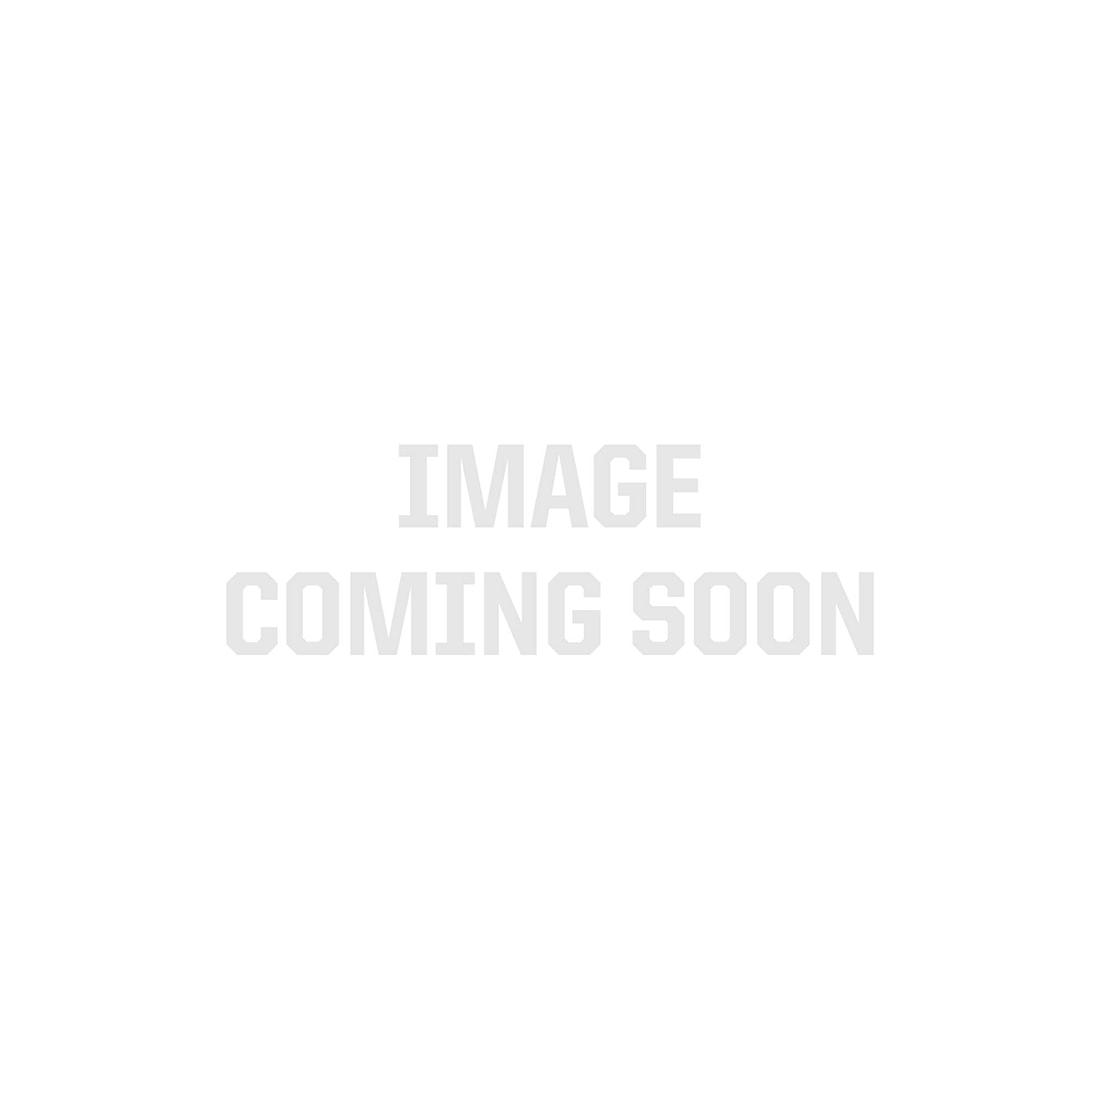 Soft White 3528 Double Row LED Strip Light, 240/m, 15mm wide, Sample Kit